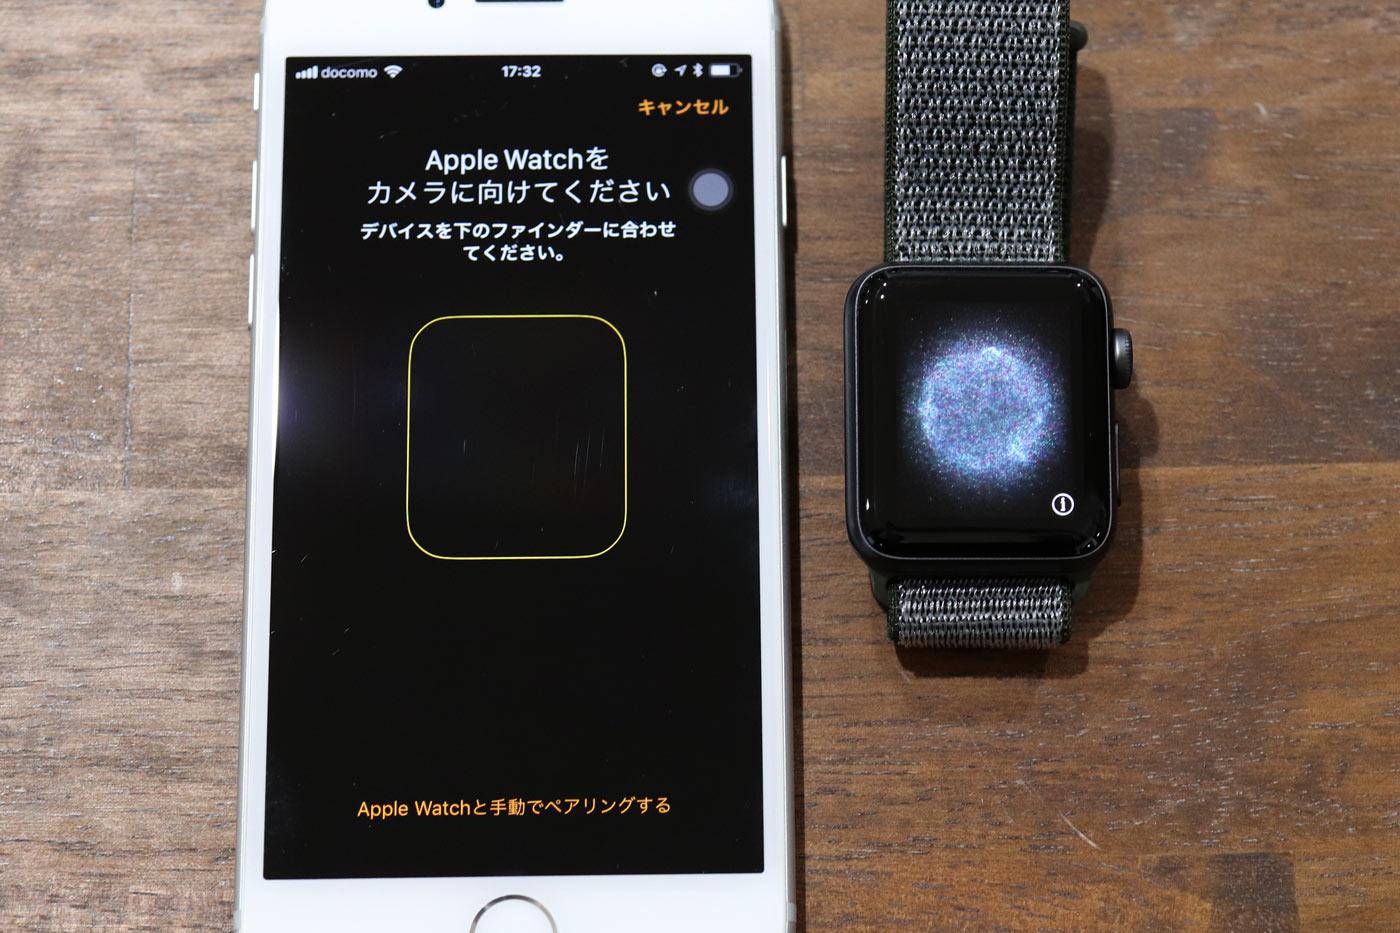 iPhoneとApple Watch 3のペアリング